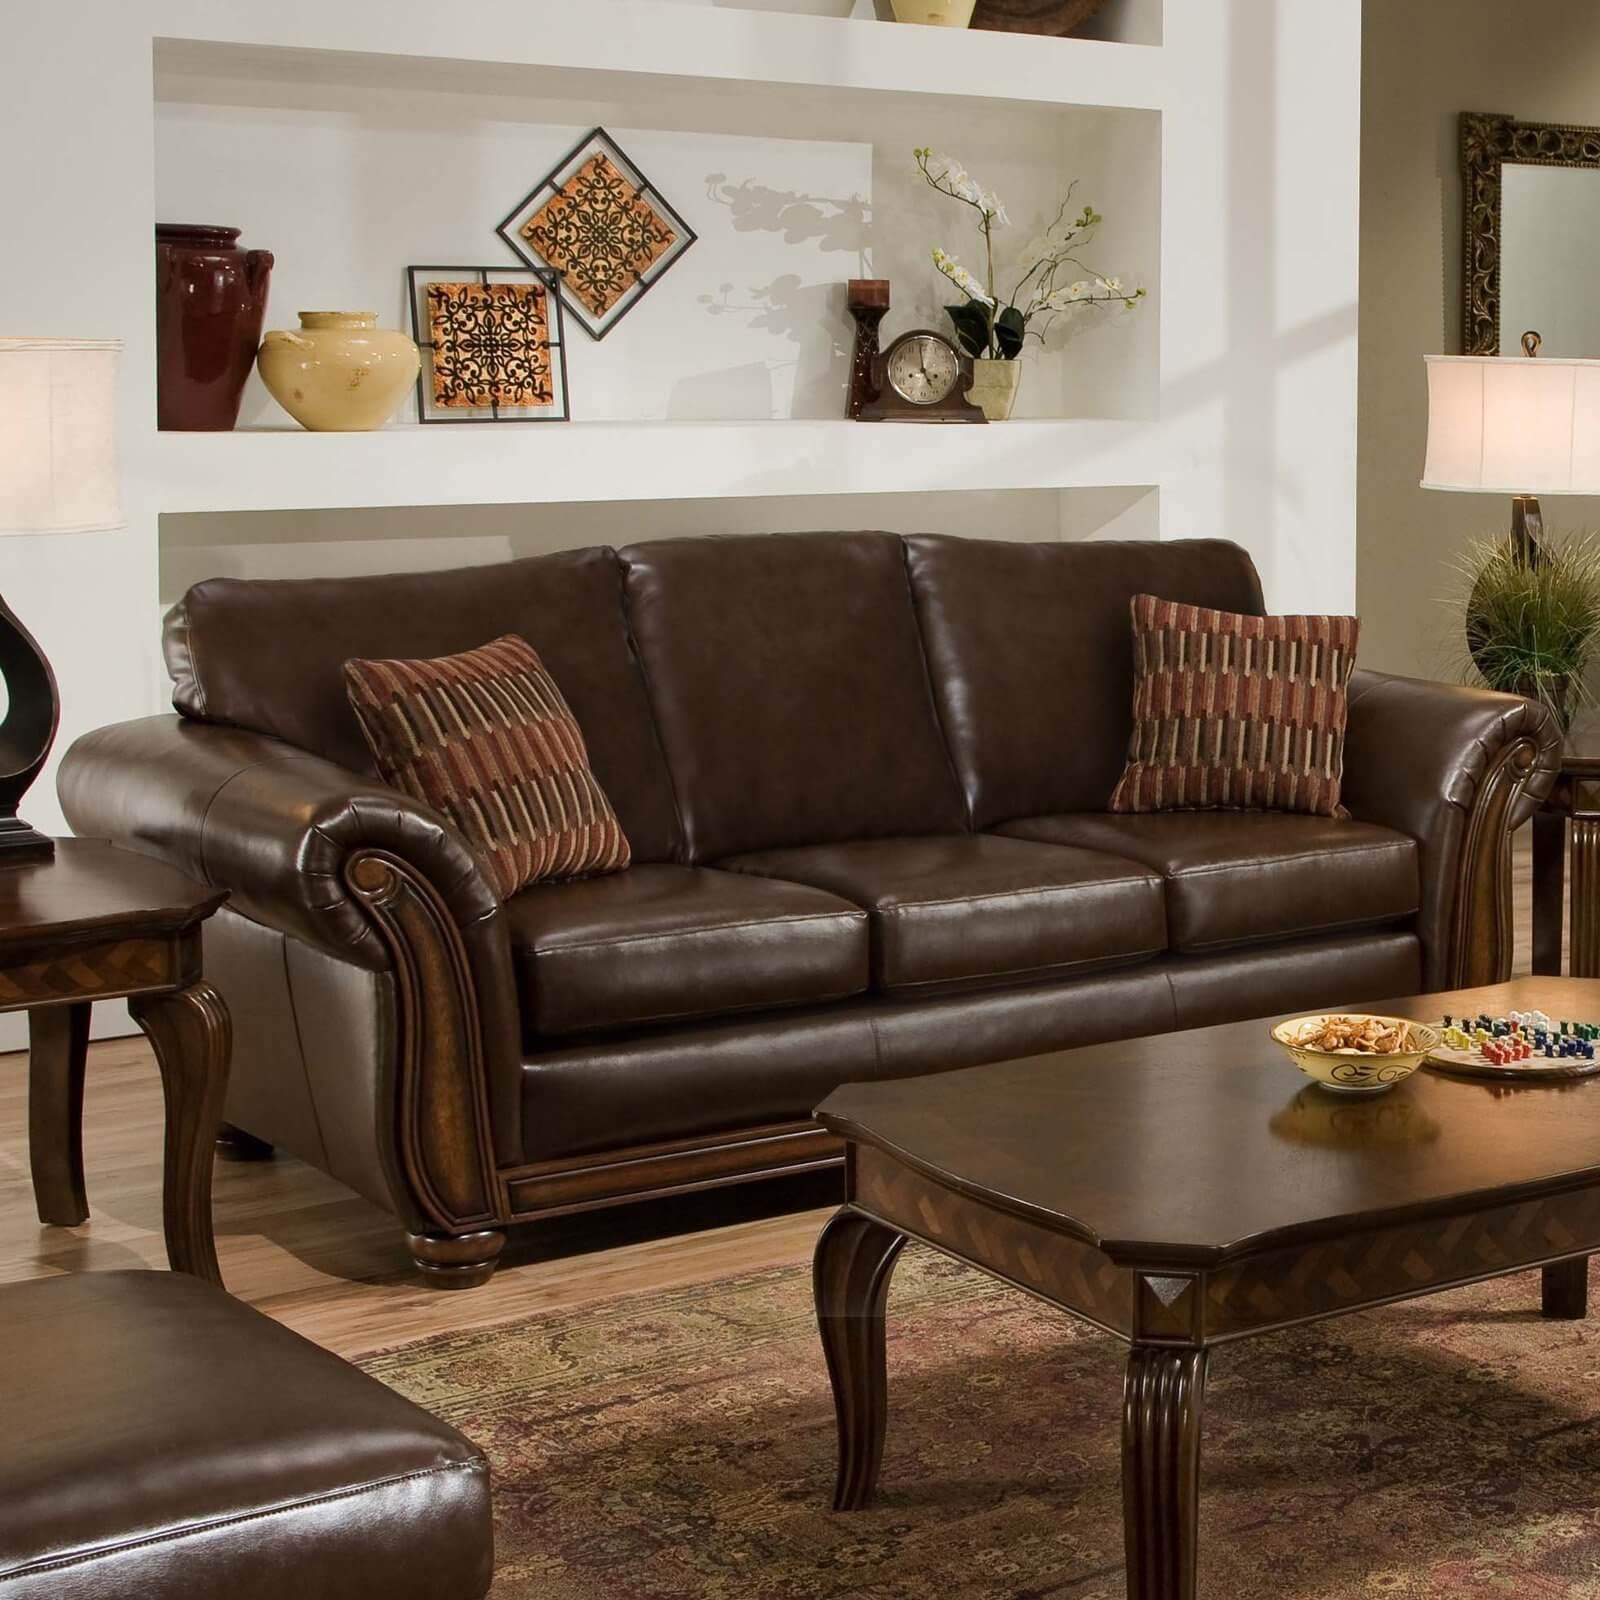 Comfortable brown leather sofa.